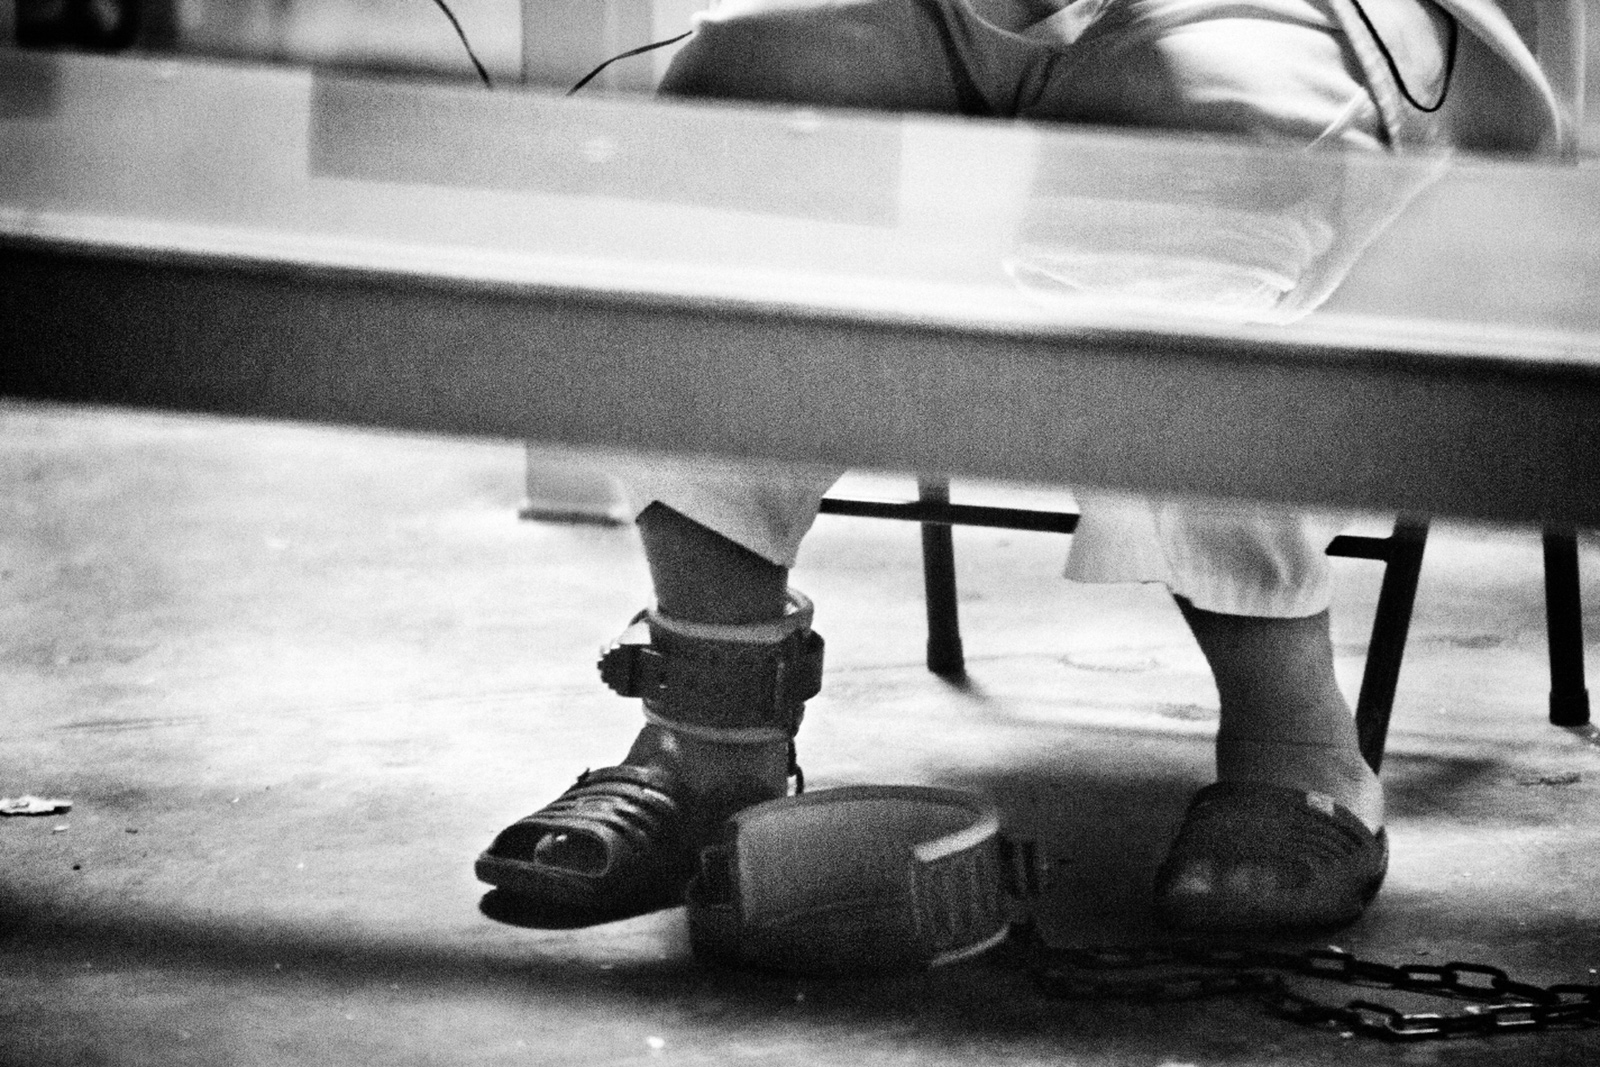 A detainee at Guantánamo, 2012